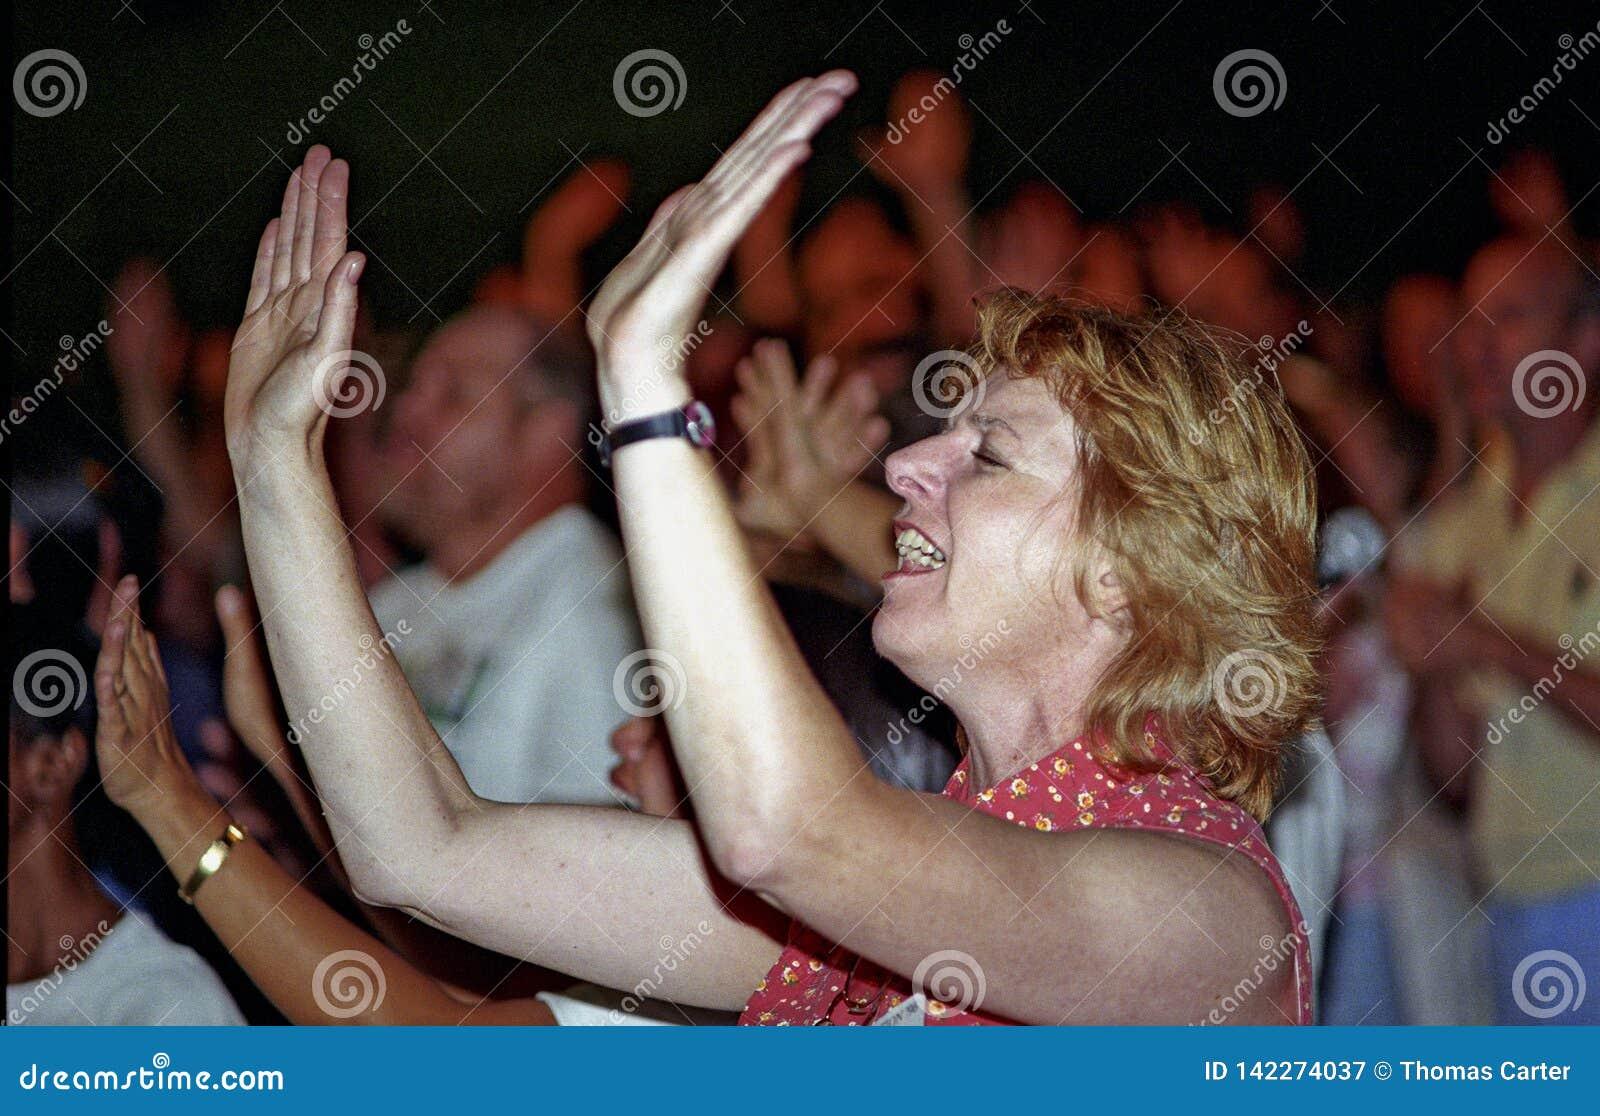 Woman worships God at a church service